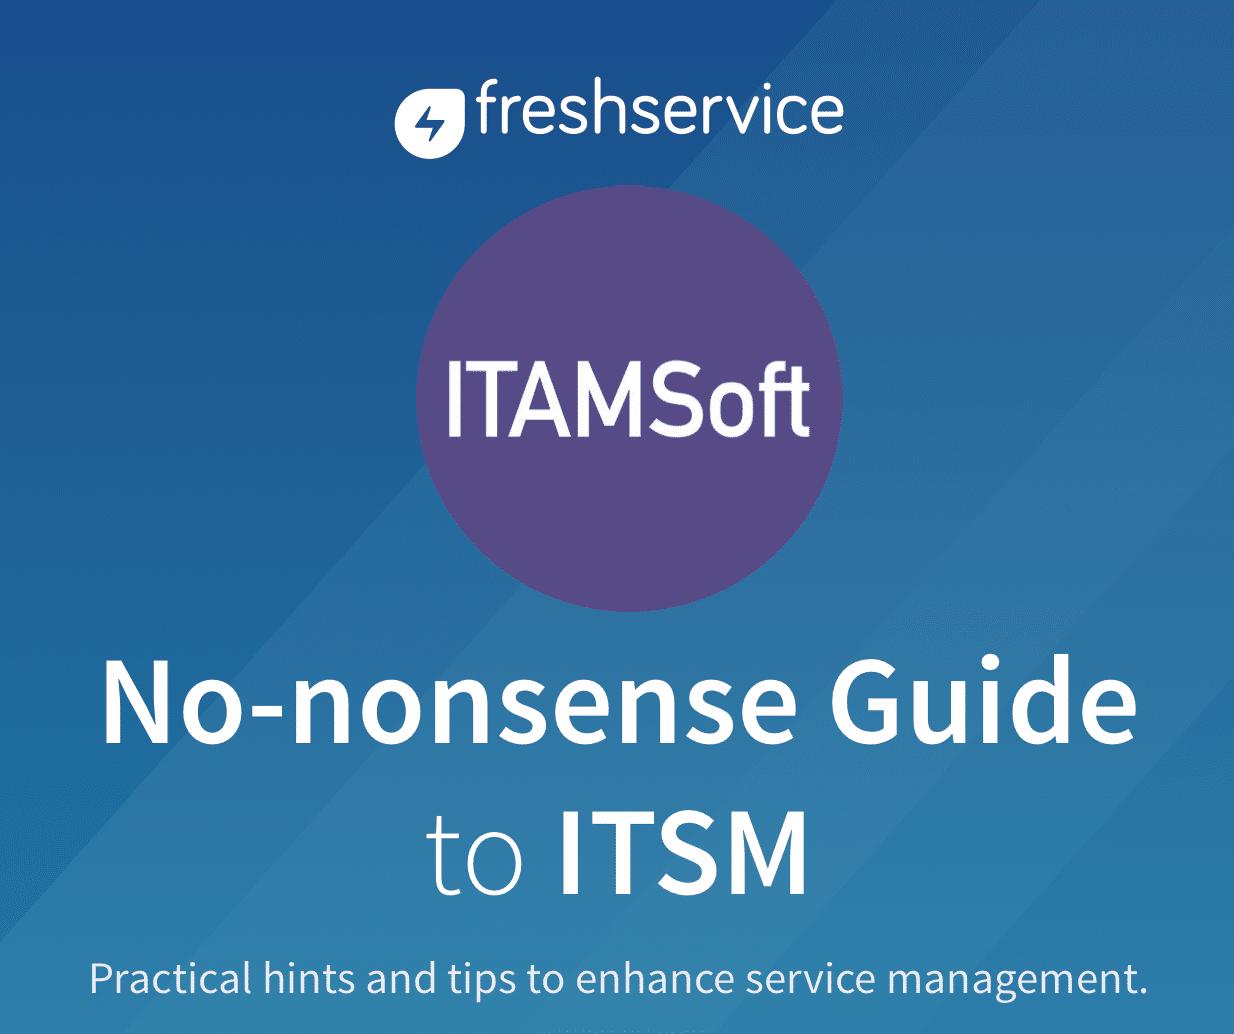 No Nonsense Guide To ITSM